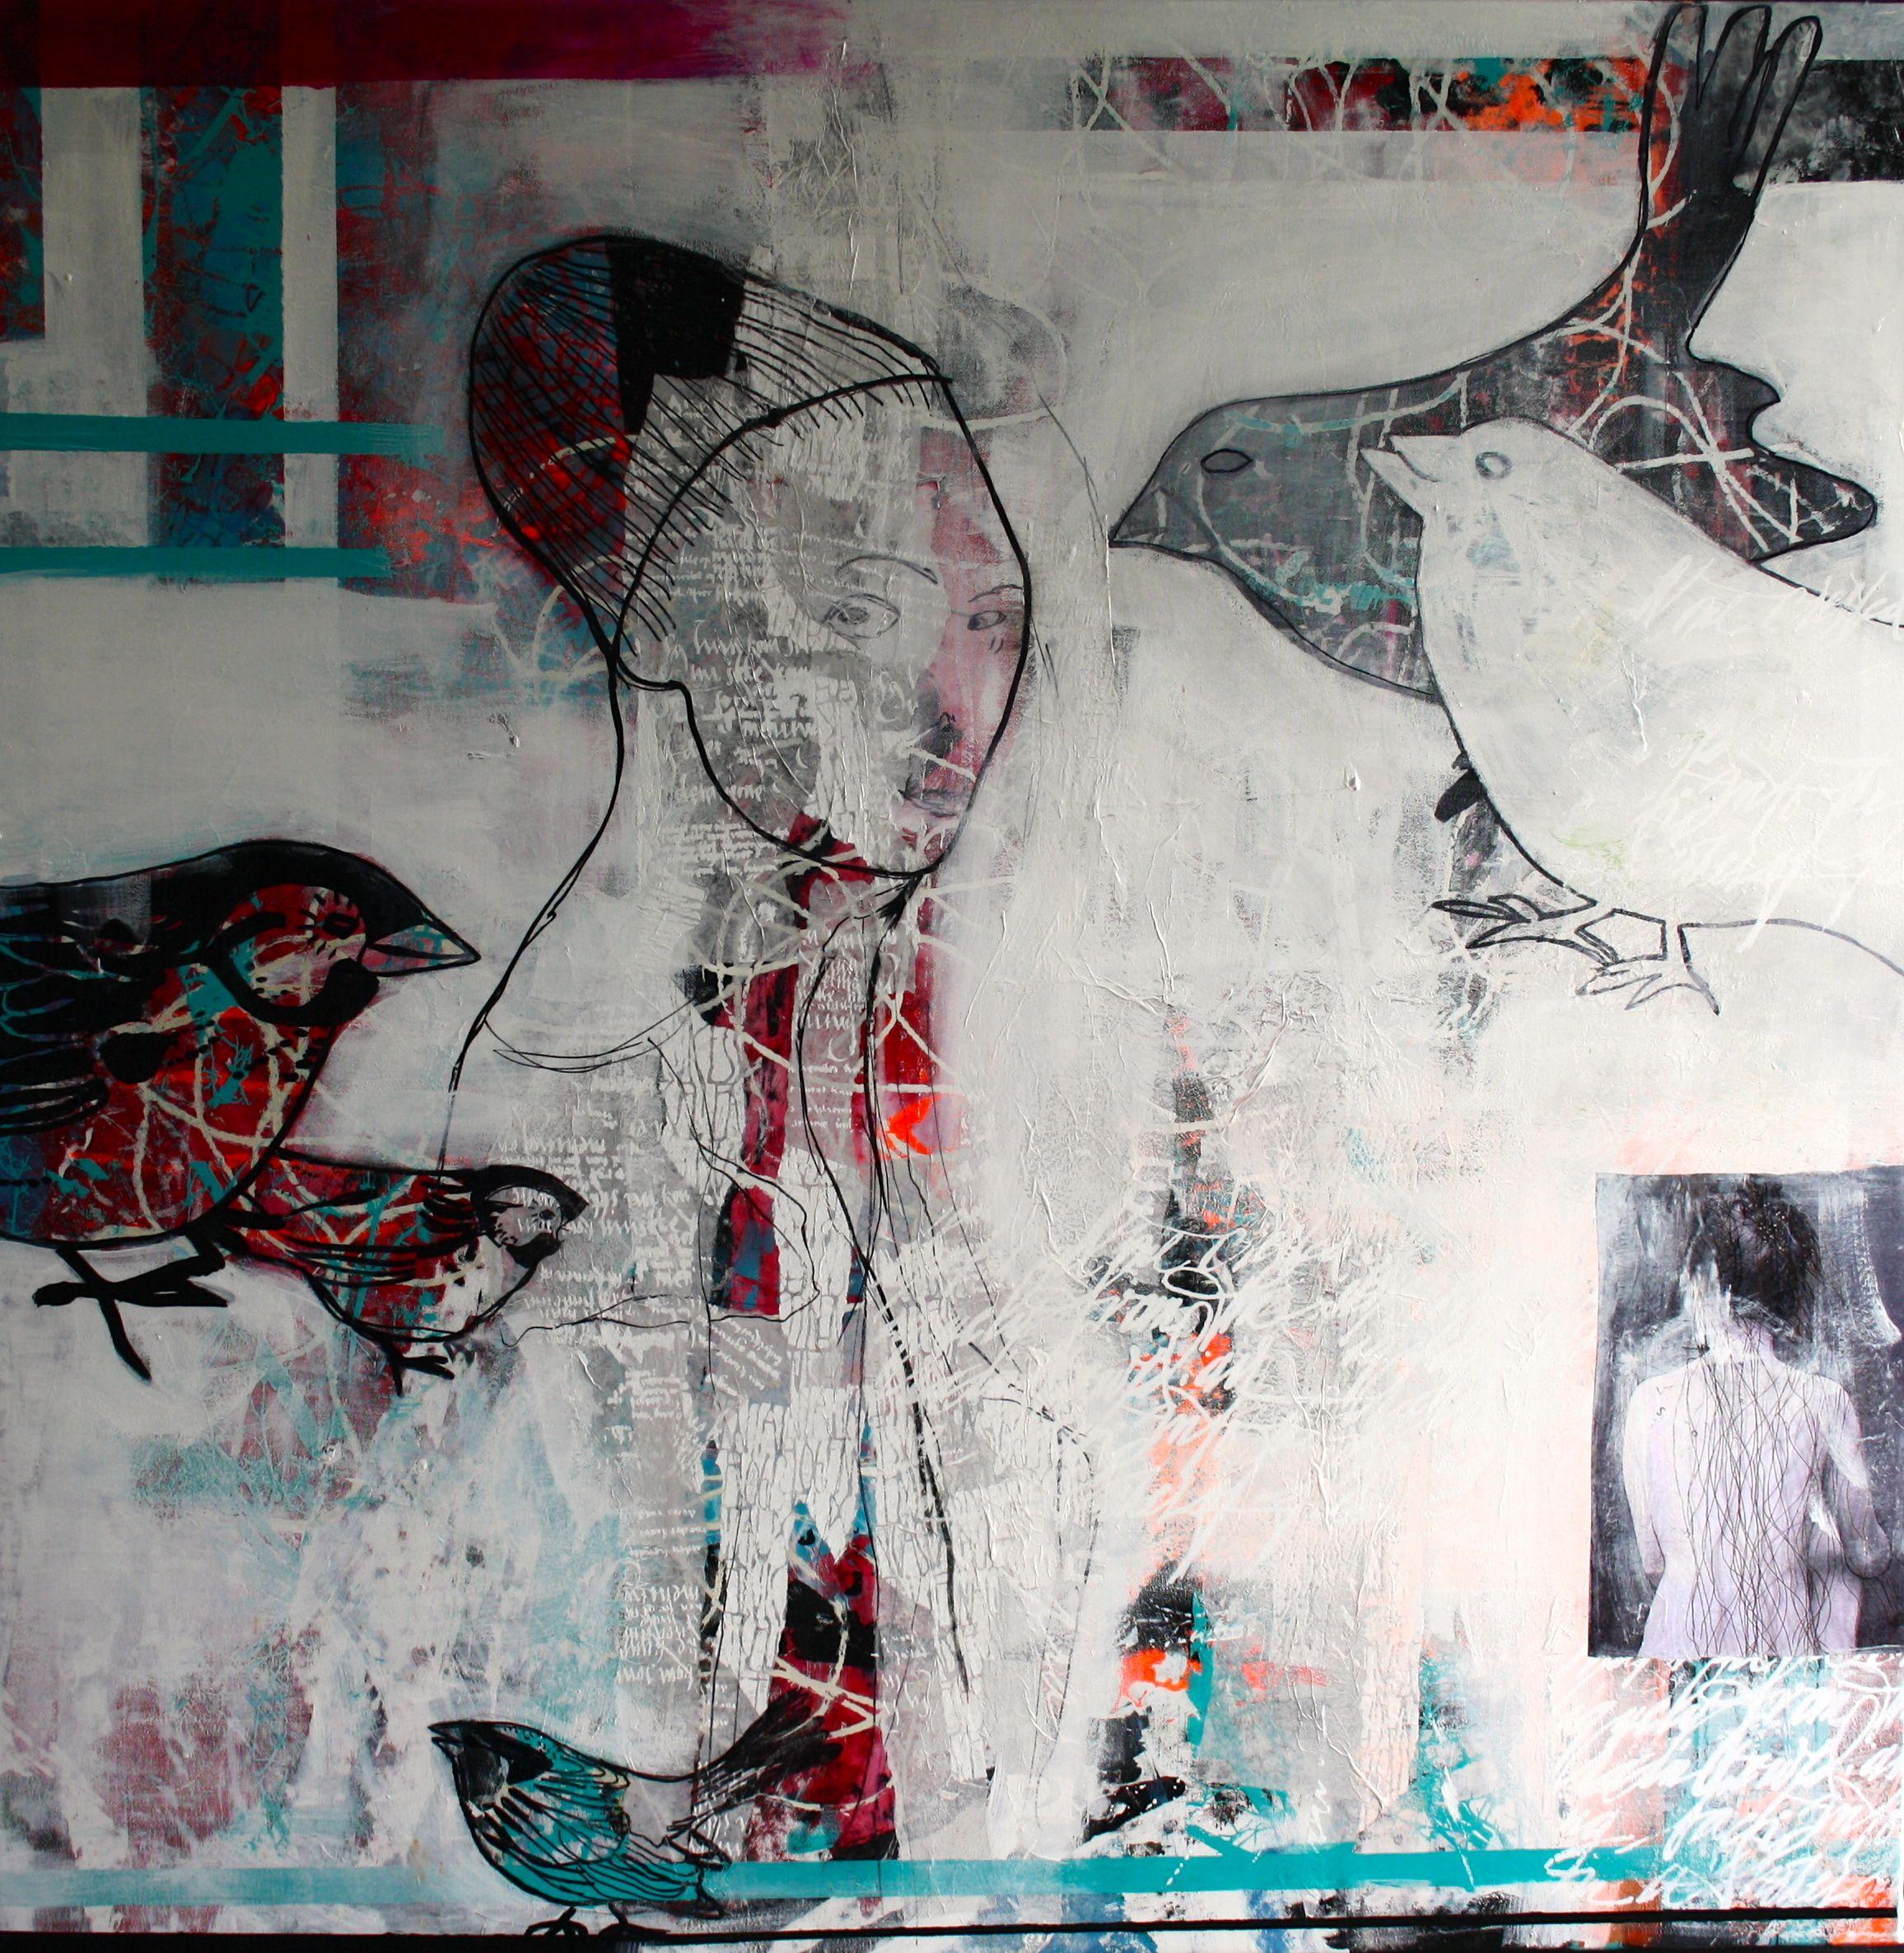 Mennesker Maleri Collage Abstrakt Art Udstillinger Kursus Akrylmaleri Rie Brodsgard Kolding Galleri Artister Maleri Kunstgalleri